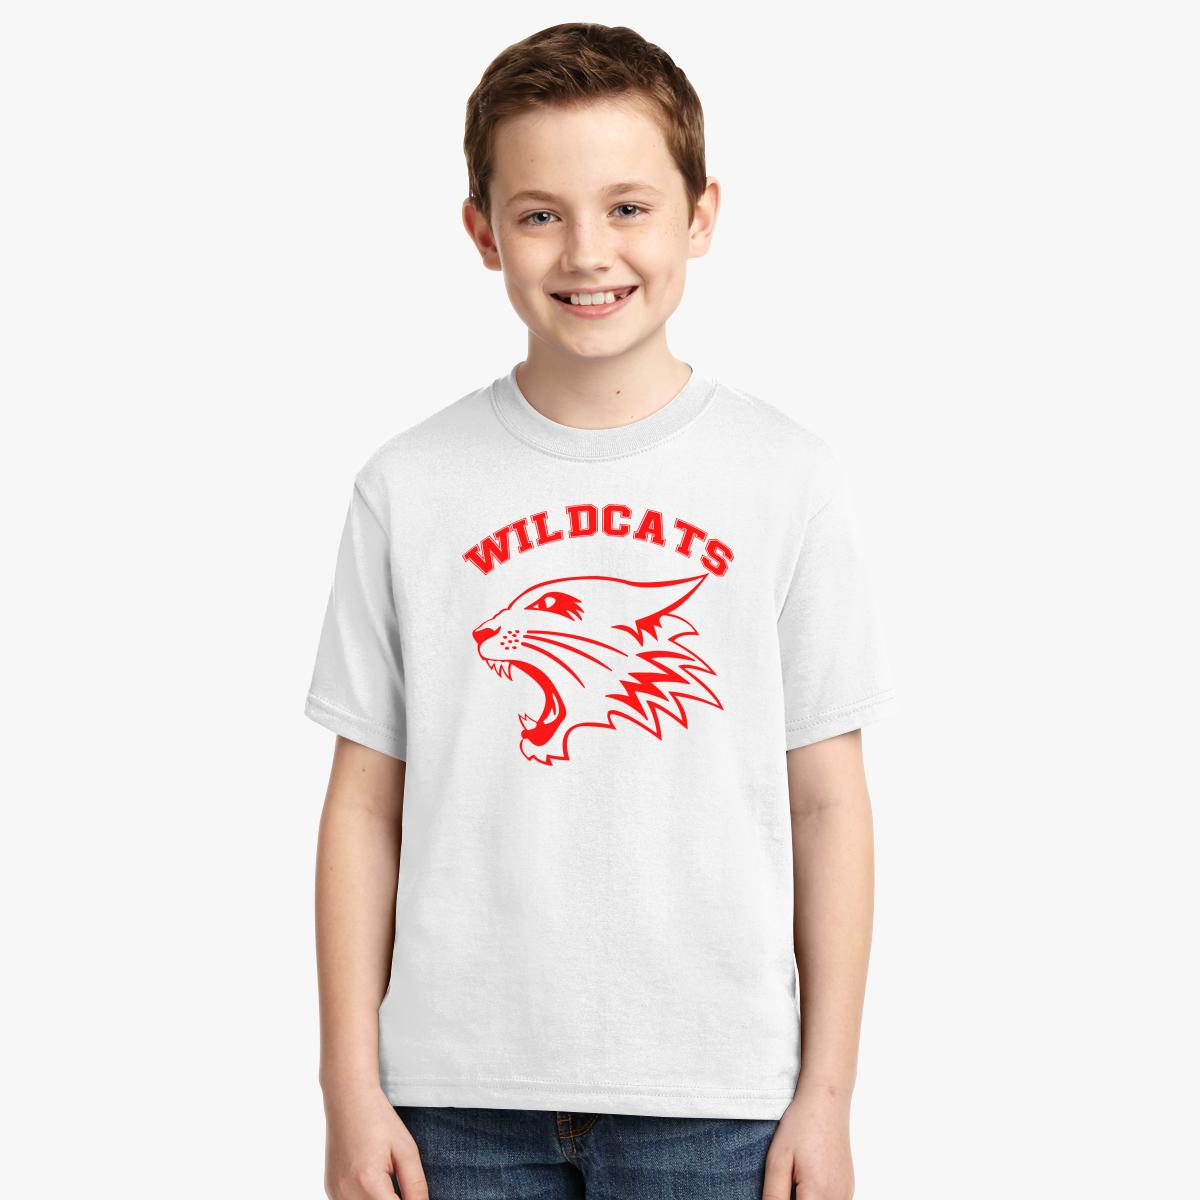 Roblox High School T Shirt Codes | RLDM